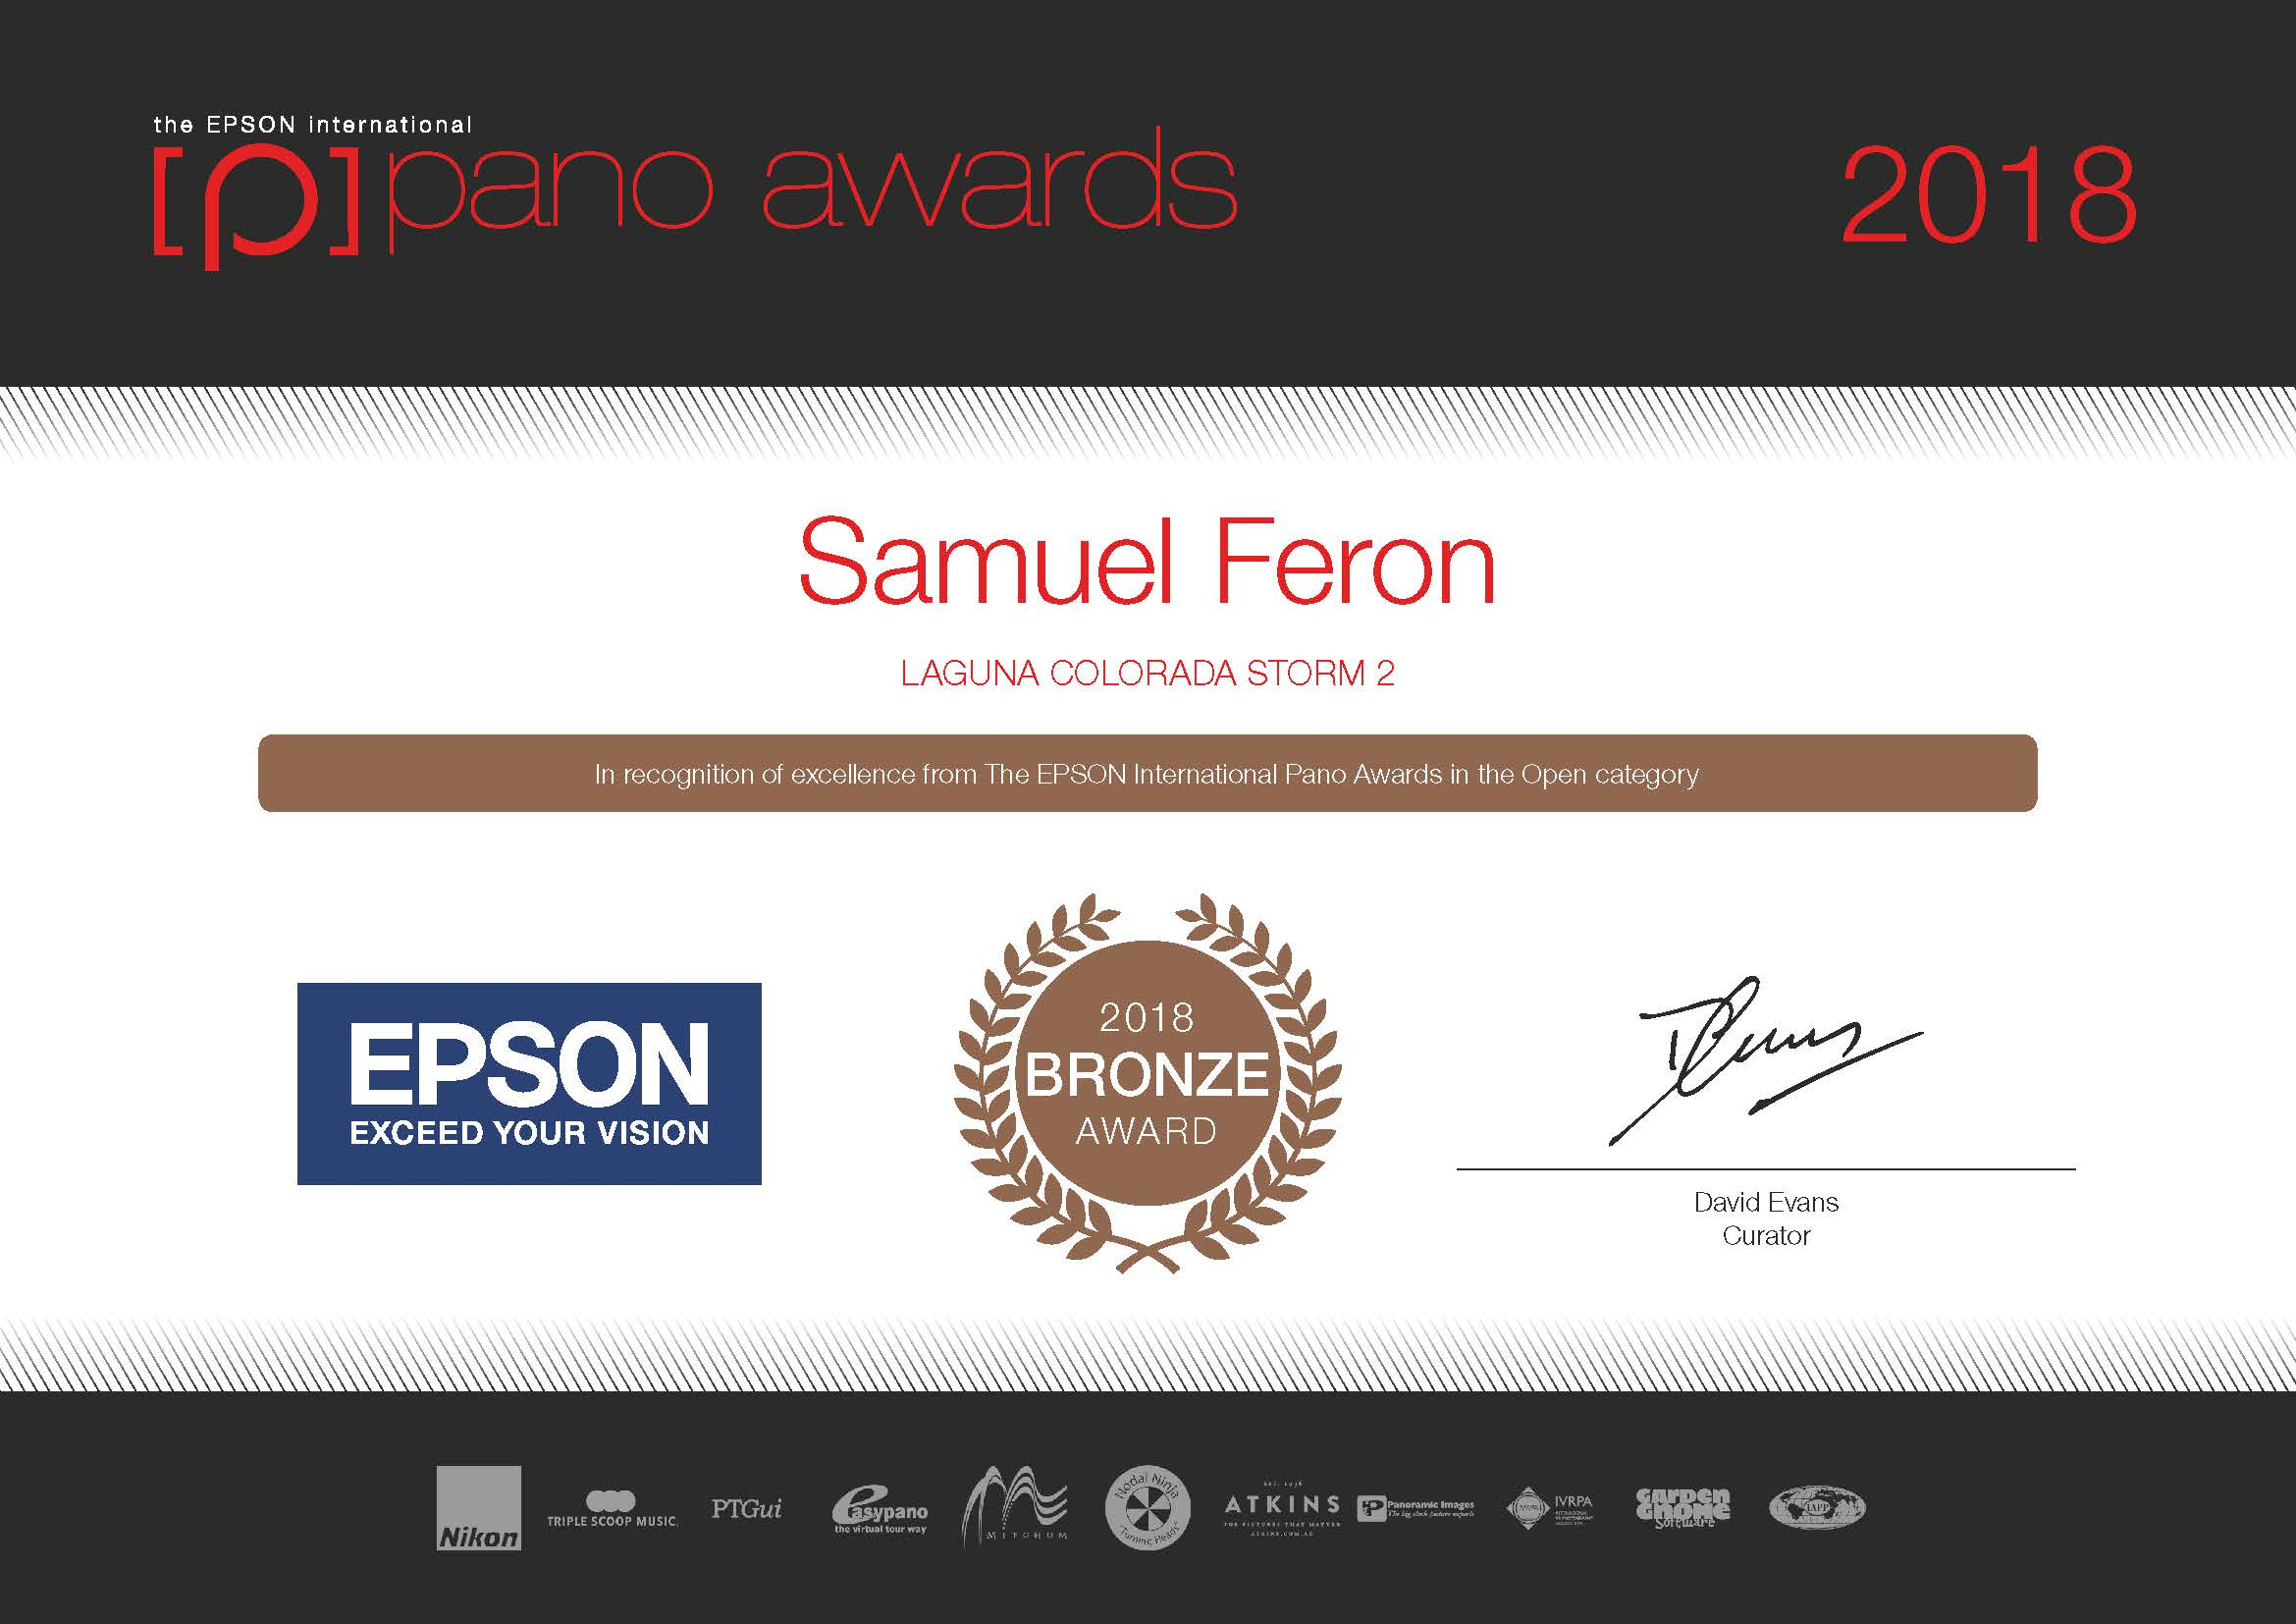 2018-Epson-Pano-Awards-Open-Bronze-453 certif.jpg